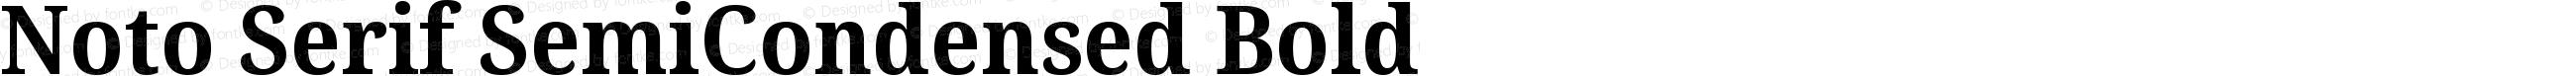 Noto Serif SemiCondensed Bold